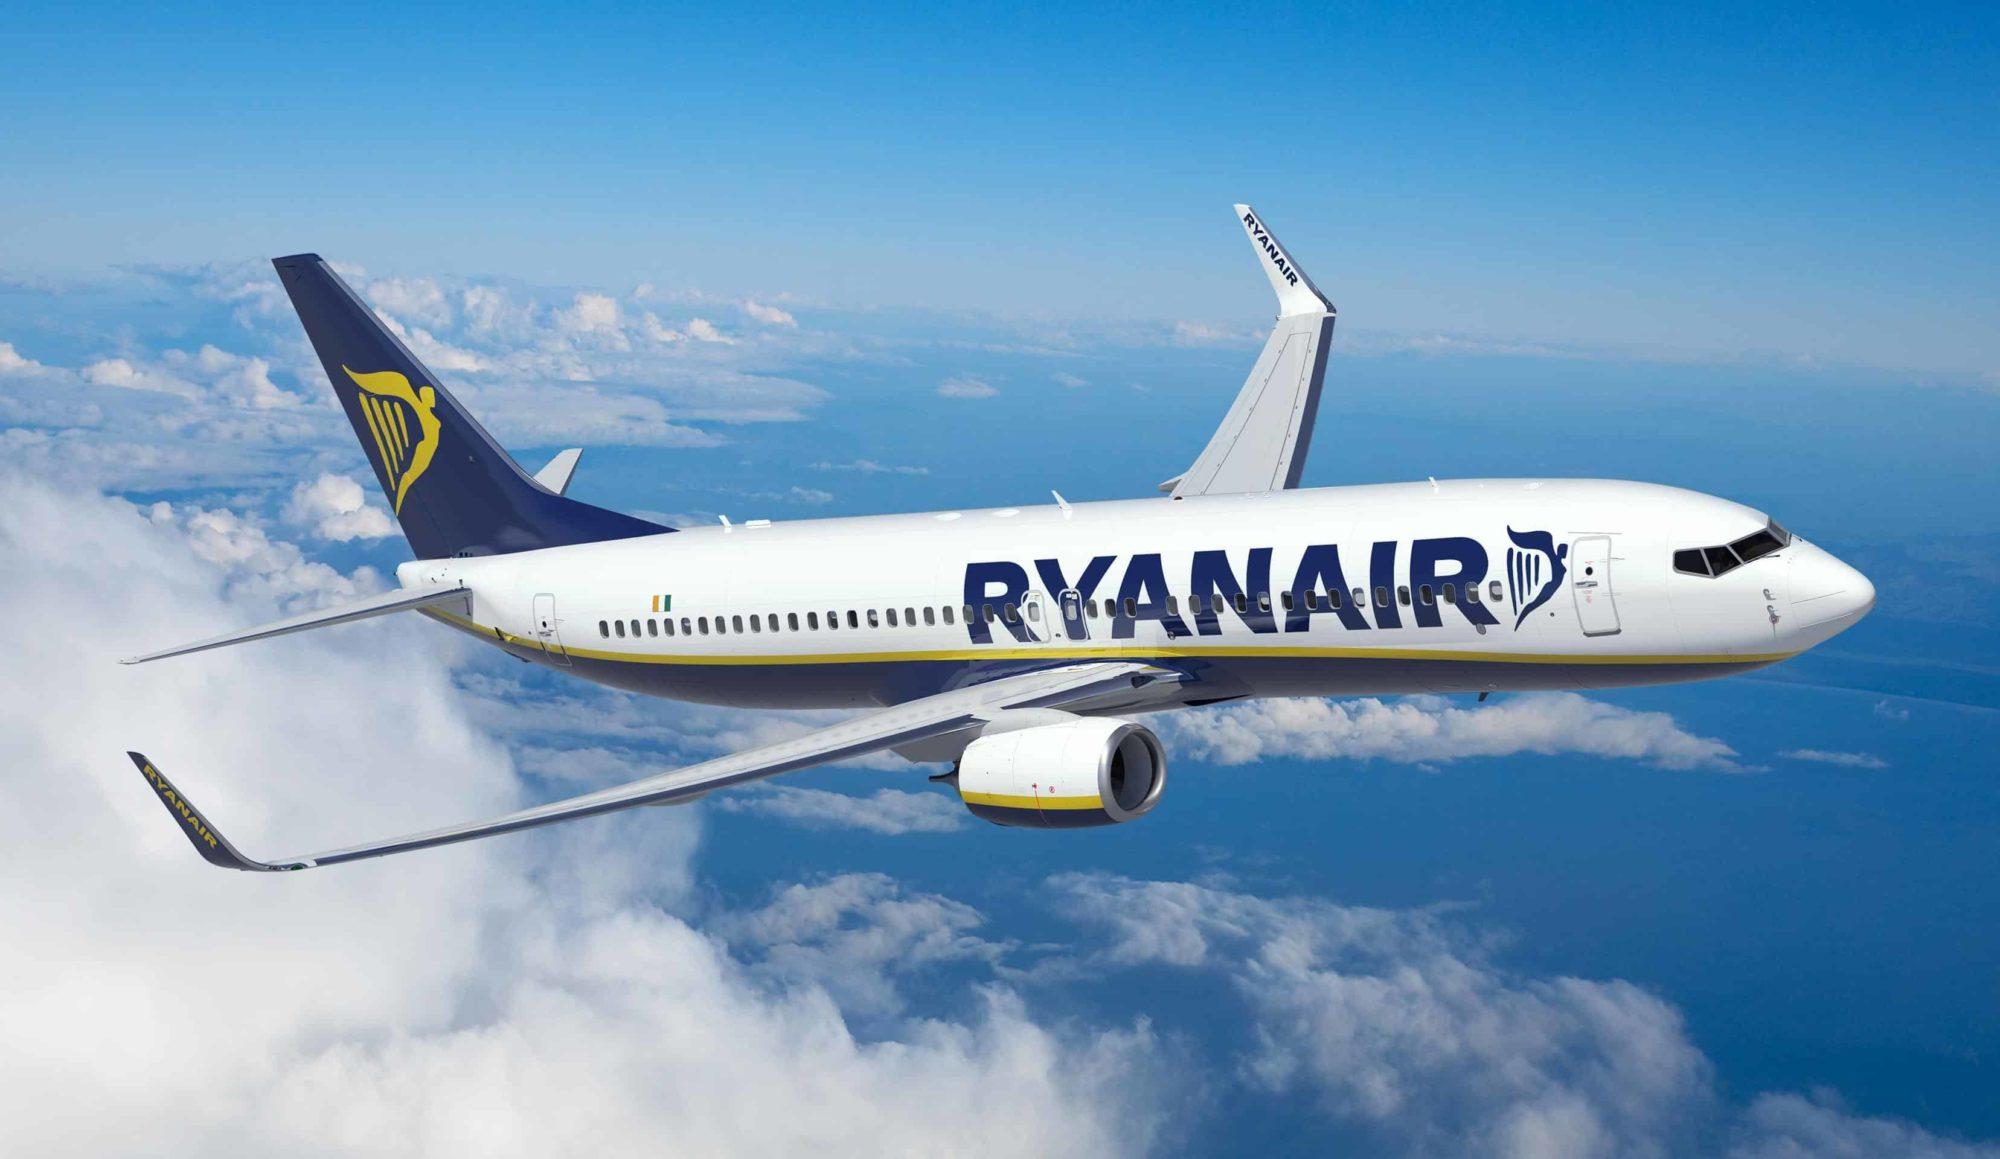 Corporate Ryan Air Plane in the Sky